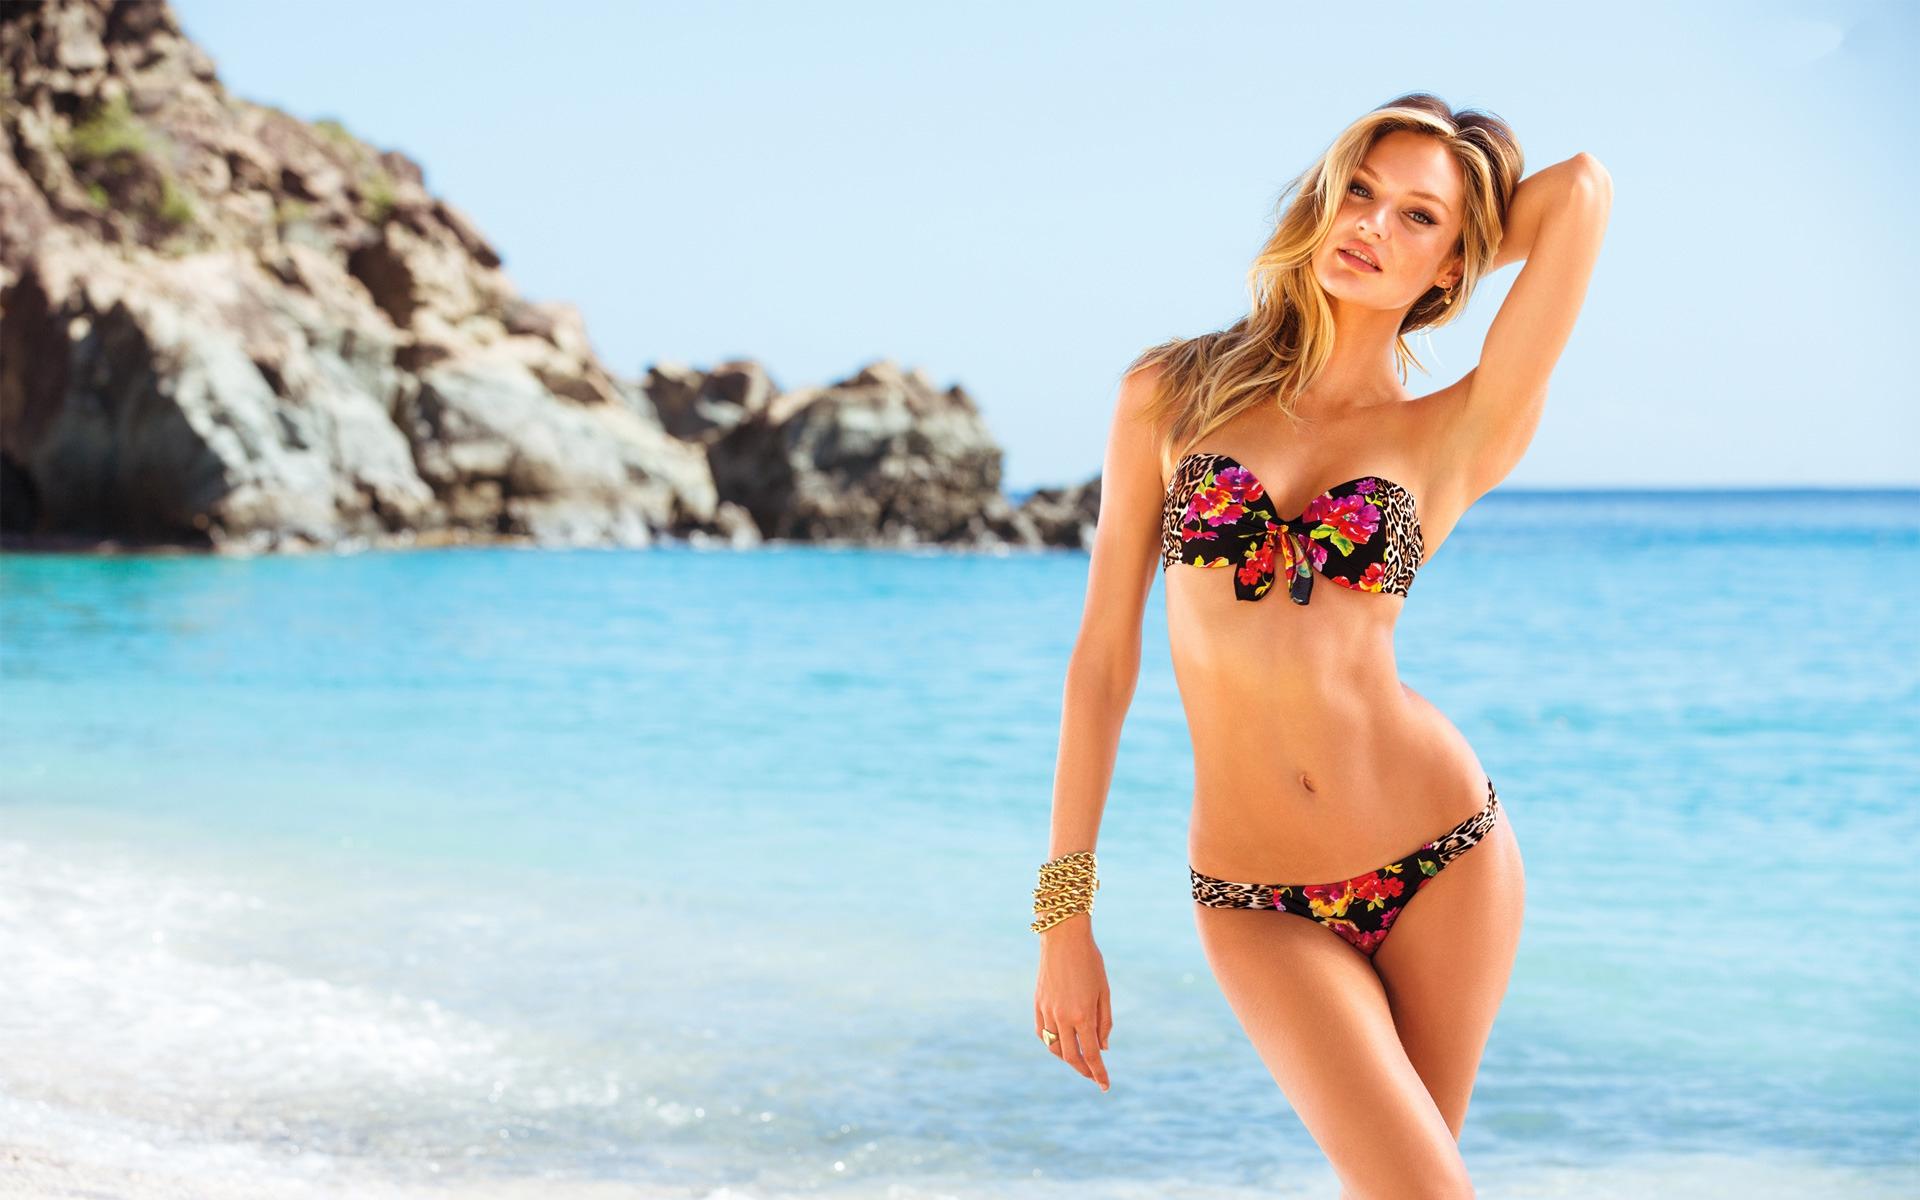 Fondos De Pantalla Candice Swanepoel Mujer Rubia Modelo